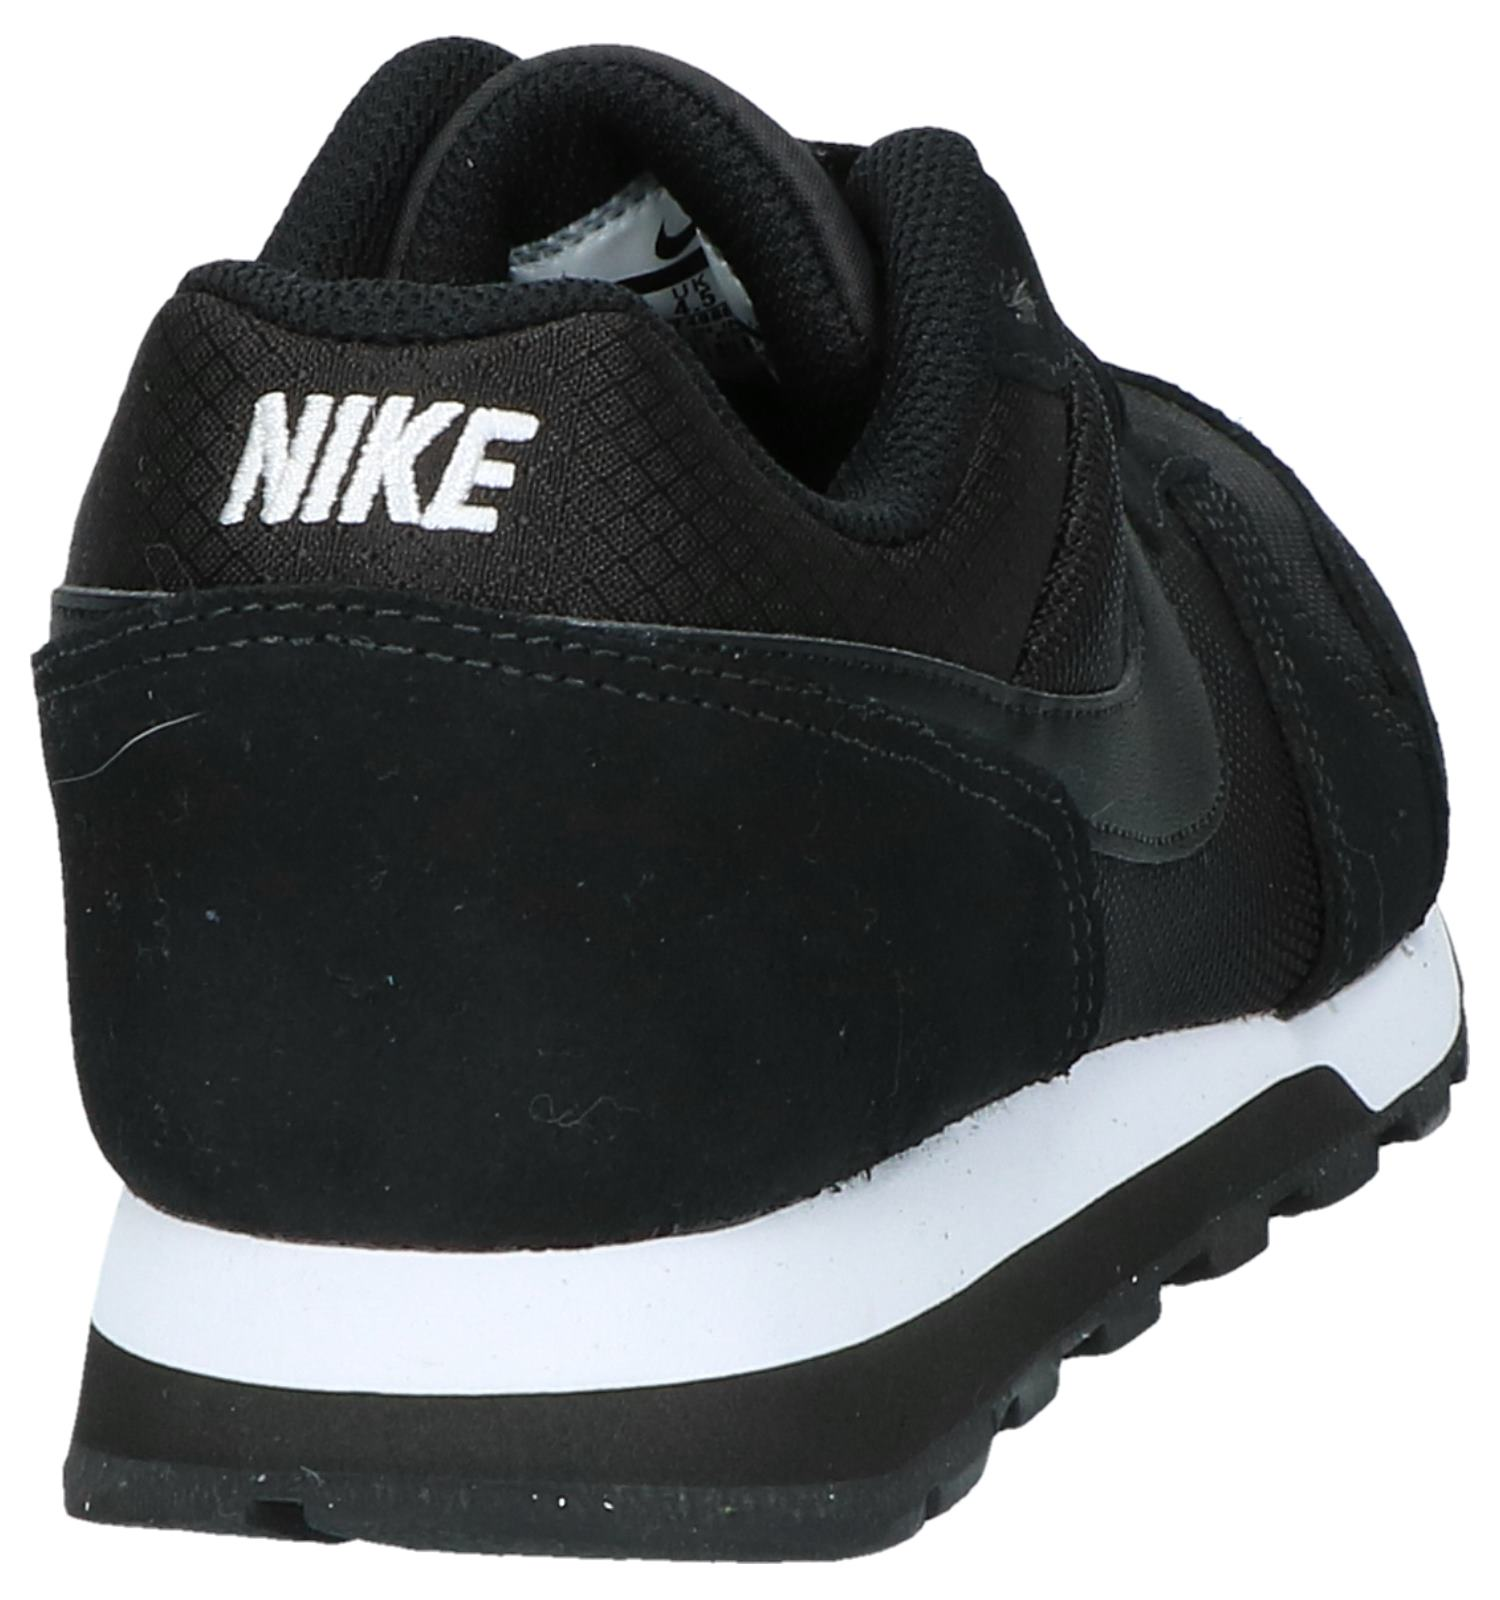 b9172a6930f Nike MD Runner 2 Lage Sneakers Zwart | TORFS.BE | Gratis verzend en retour